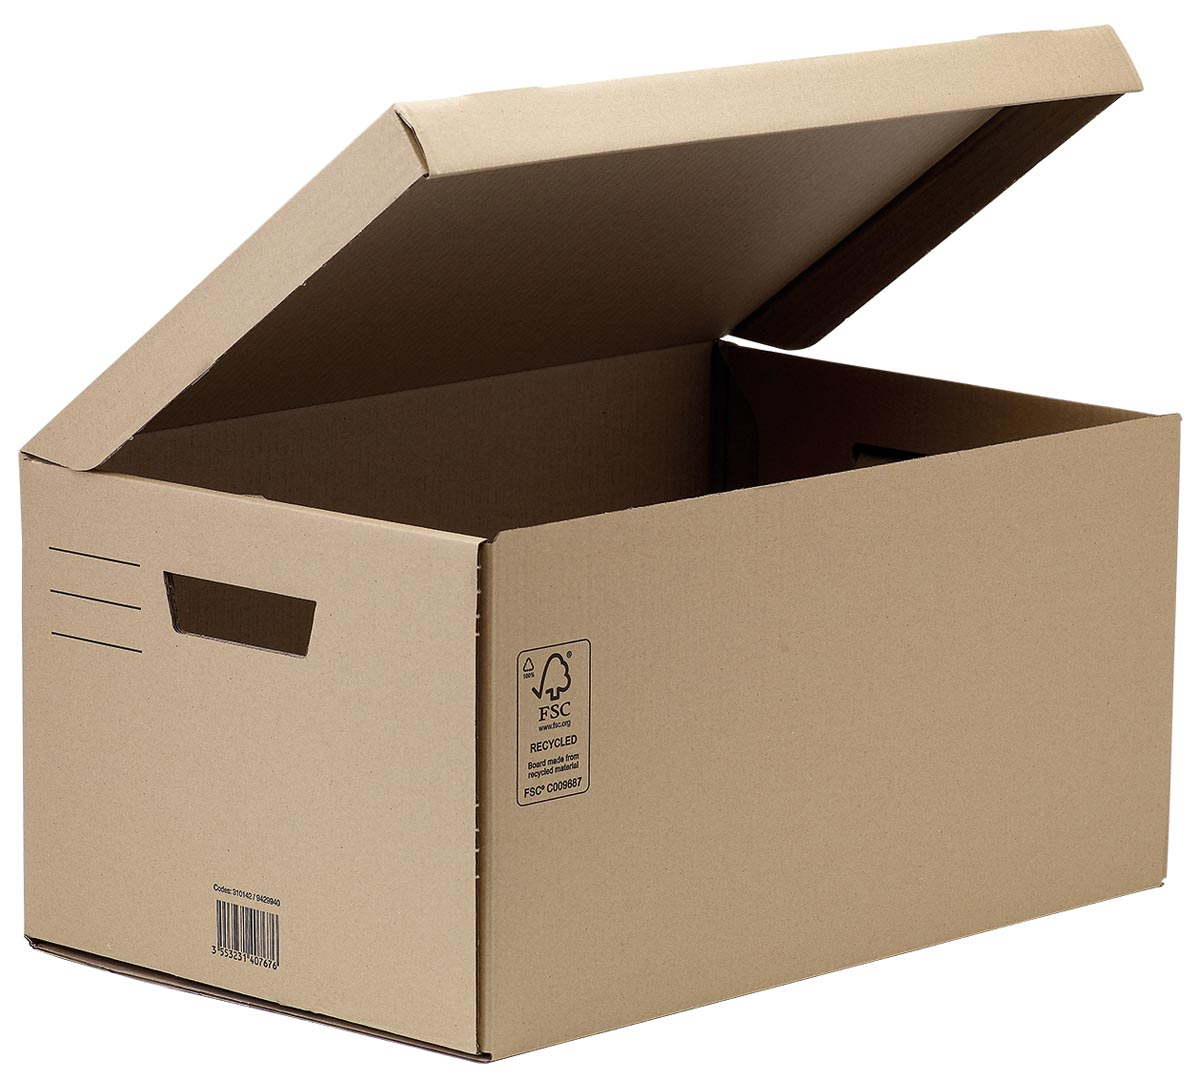 Flip Top containerdoos